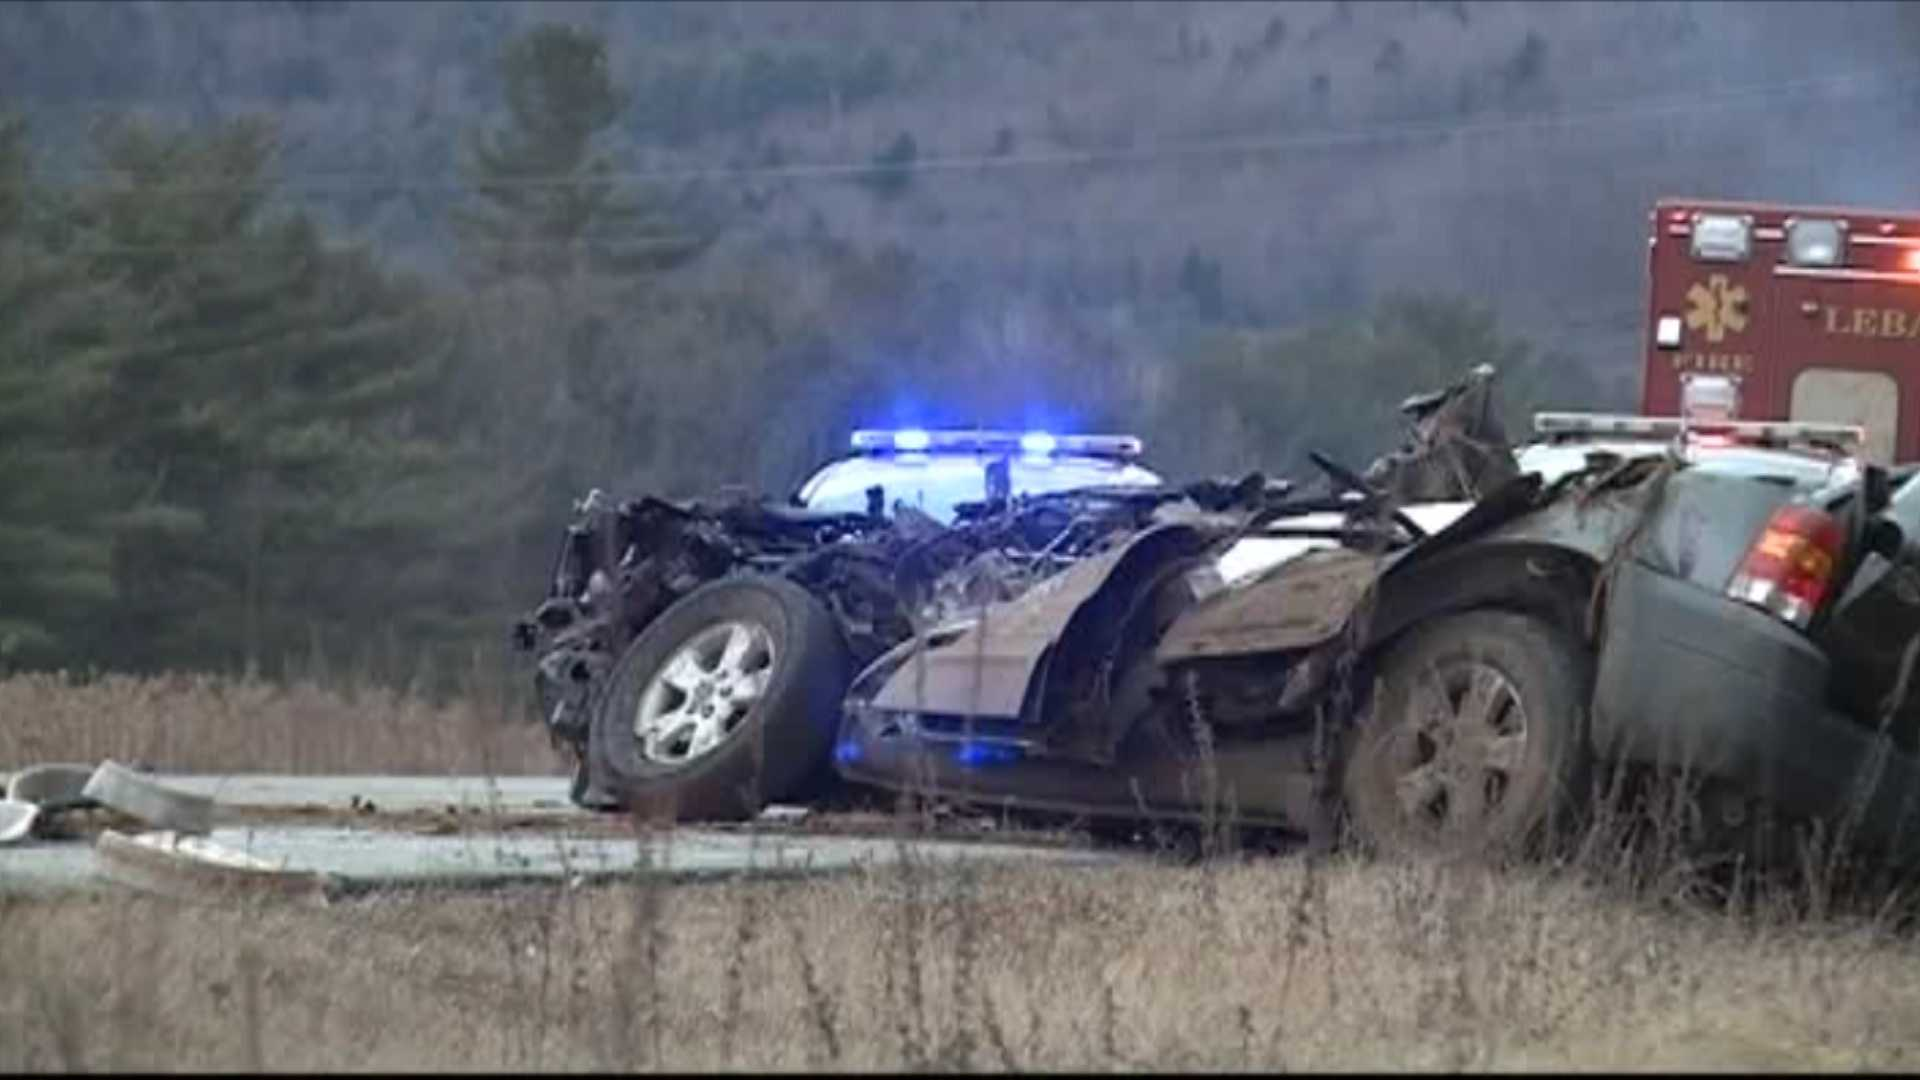 12-8-13 Identities released in fatal interstate crash - img